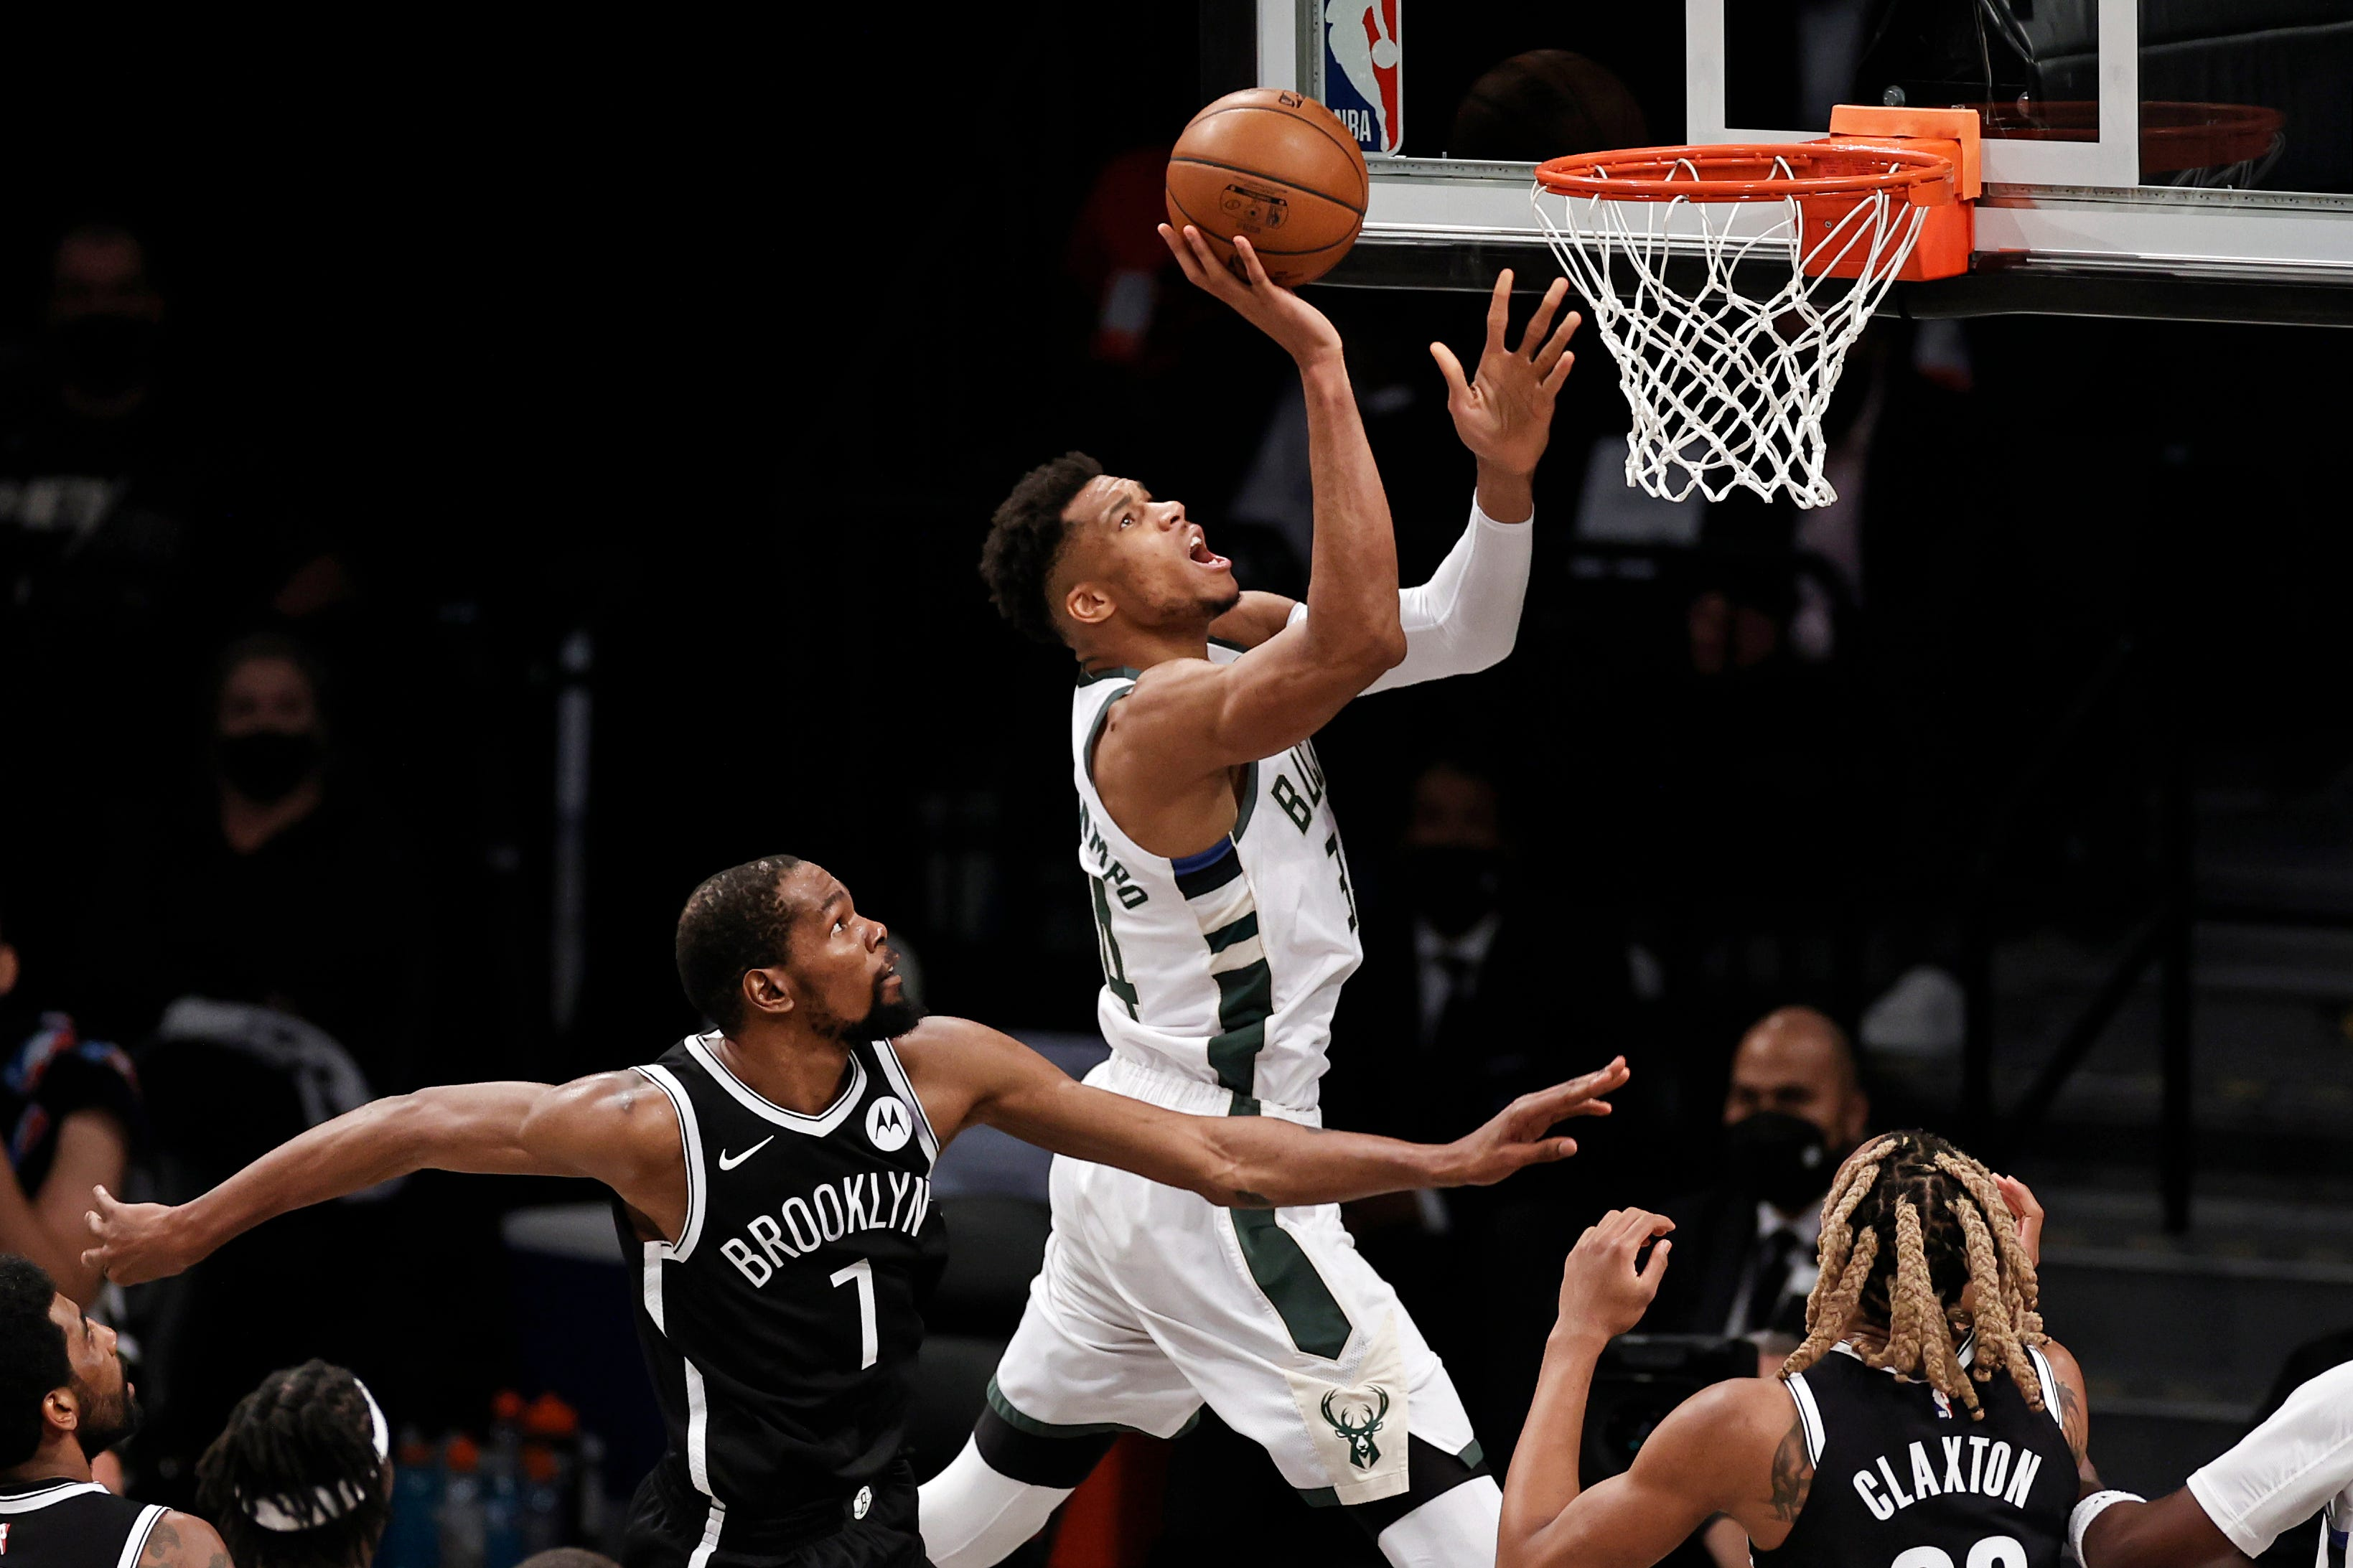 Impact Player: Bucks need Giannis Antetokounmpo to play more like an MVP